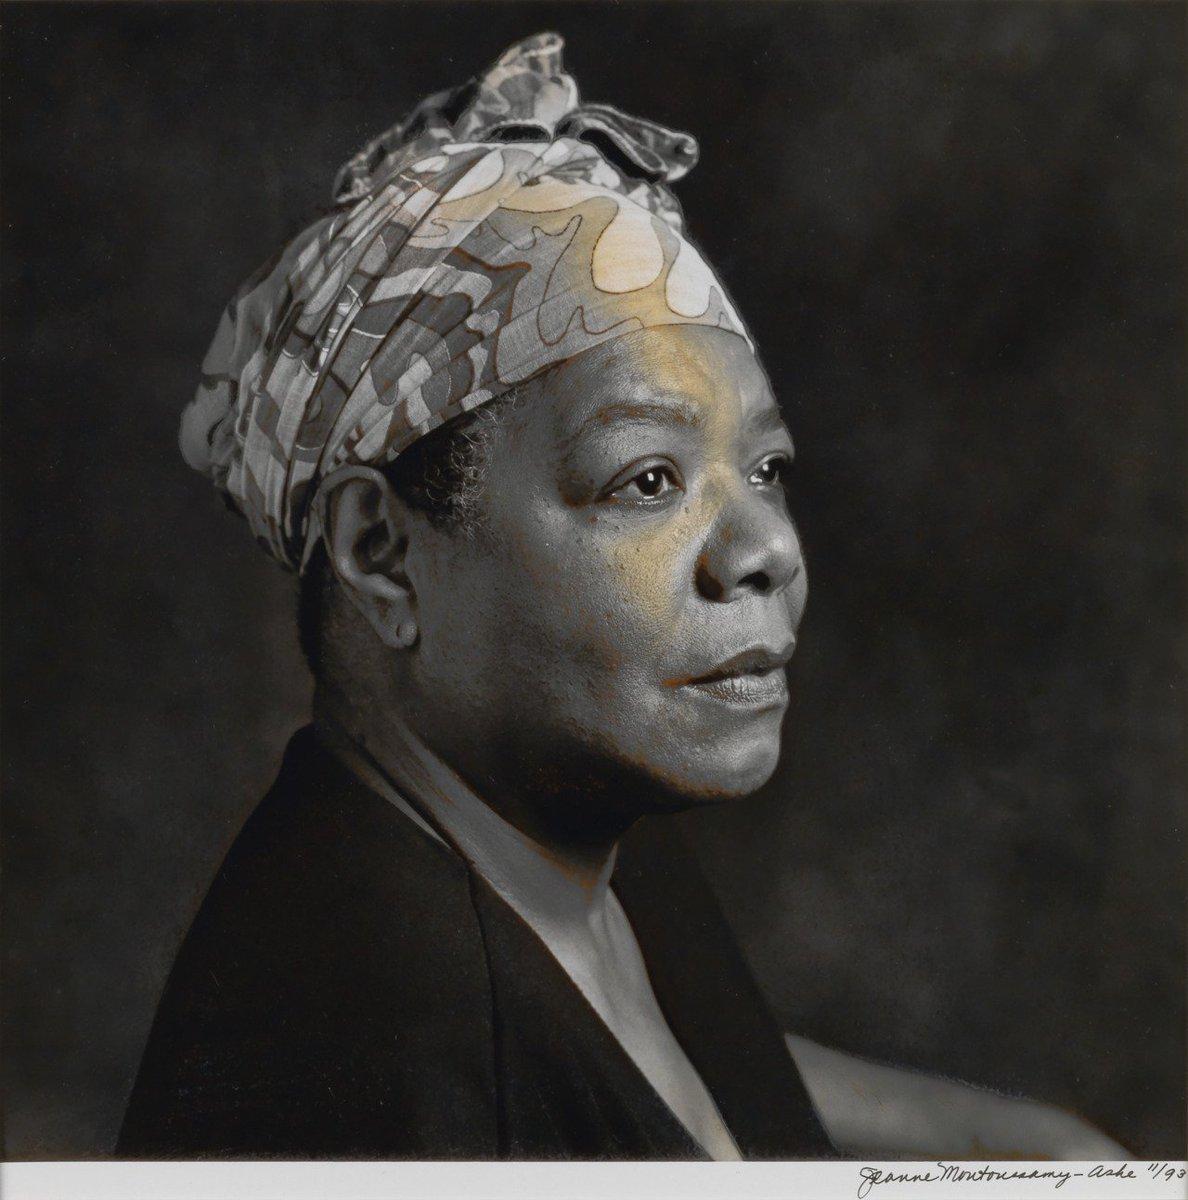 RT @womensart1: African American photographer Jeanne Moutoussamy-Ashe, Portrait of Maya Angelou (1993) #womensart https://t.co/ys6LgPS88L